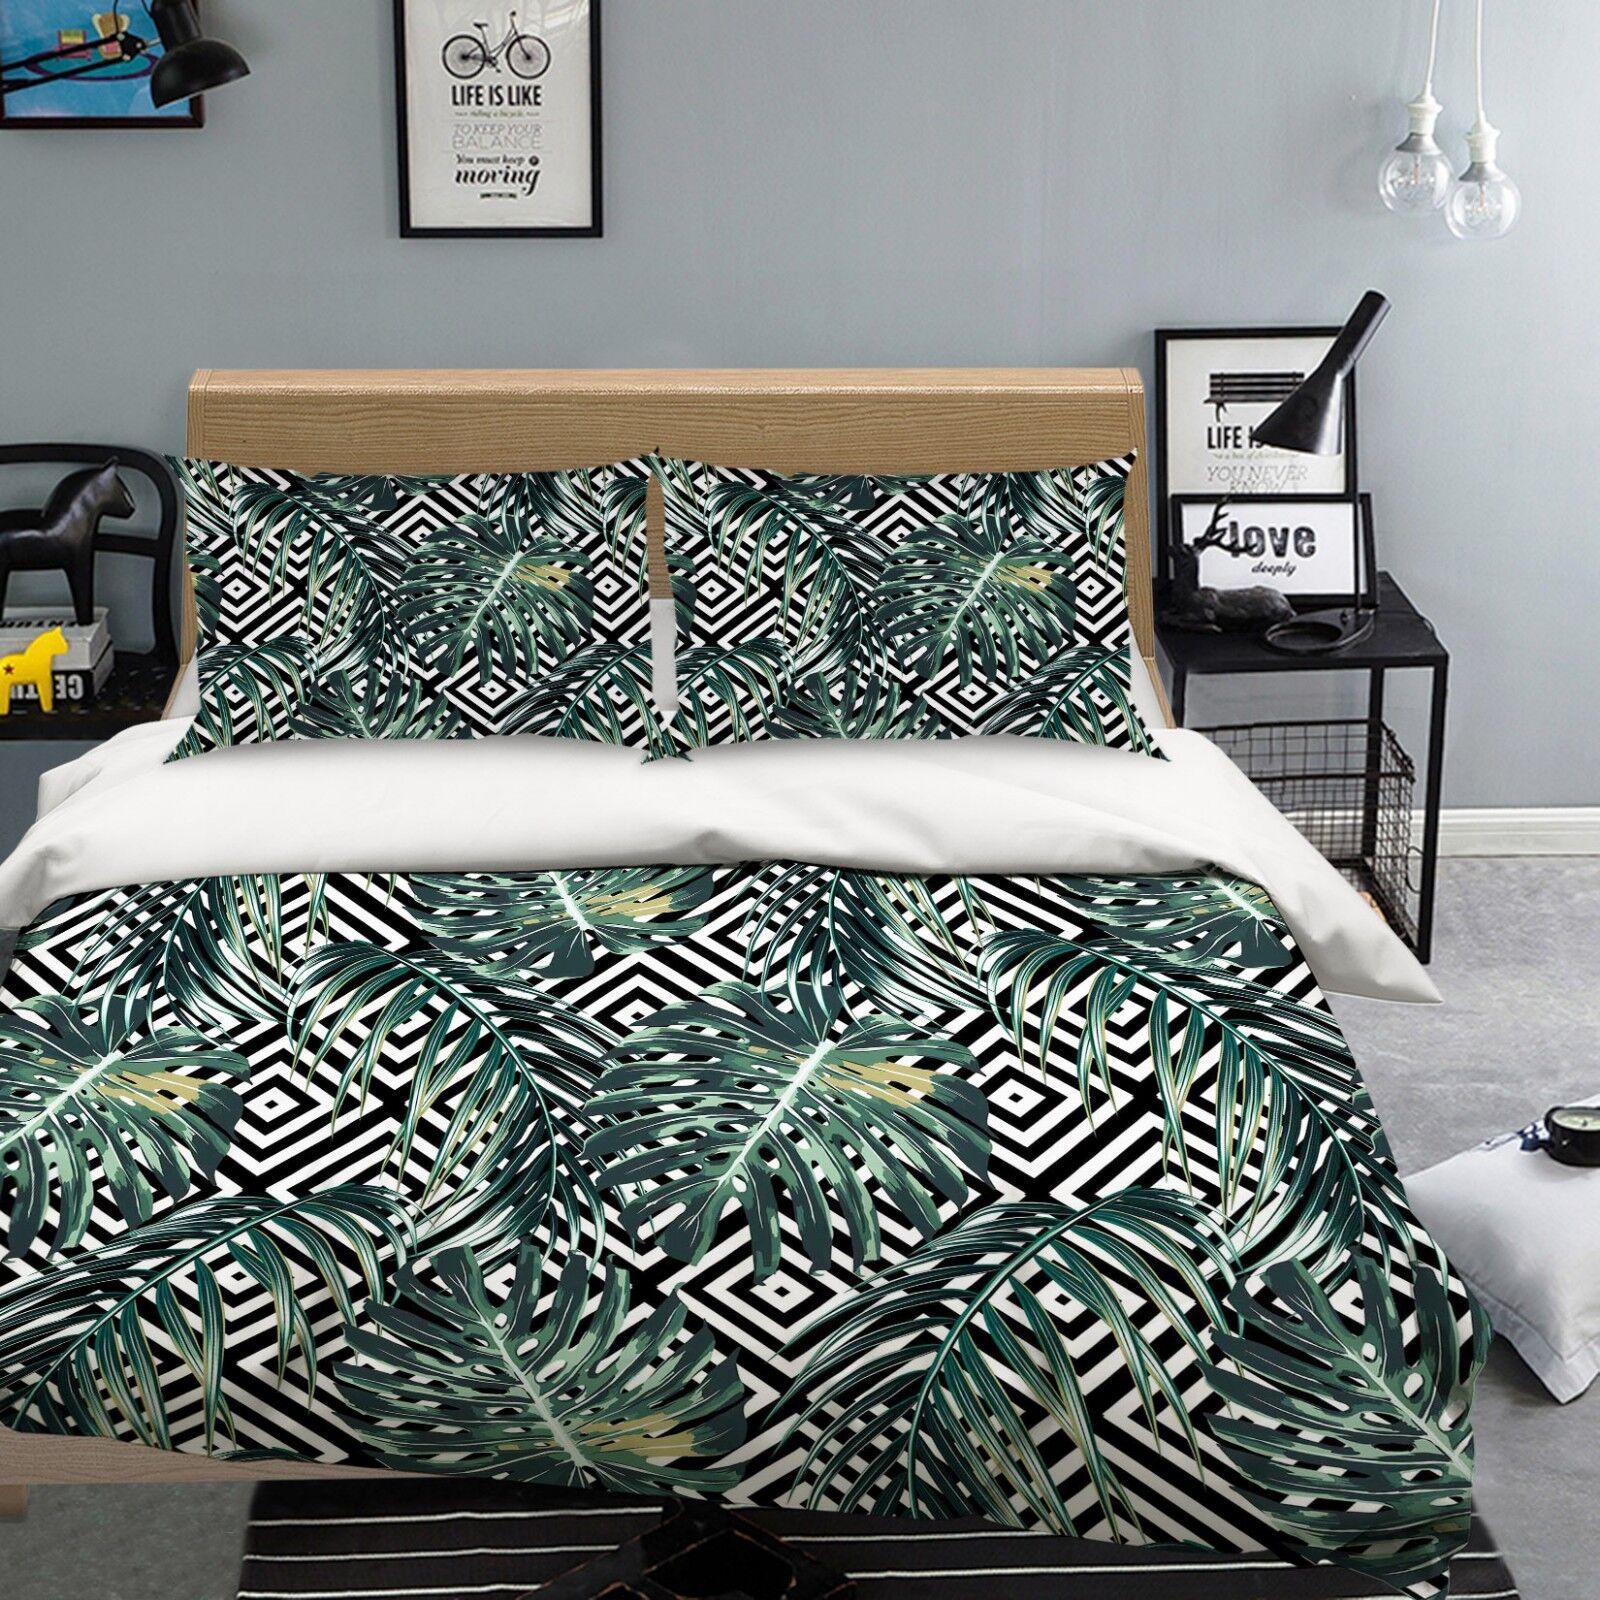 3d di colore verde 24 Federe Letto steppe de duvet set soffitto single regina de steppe cd4aaa